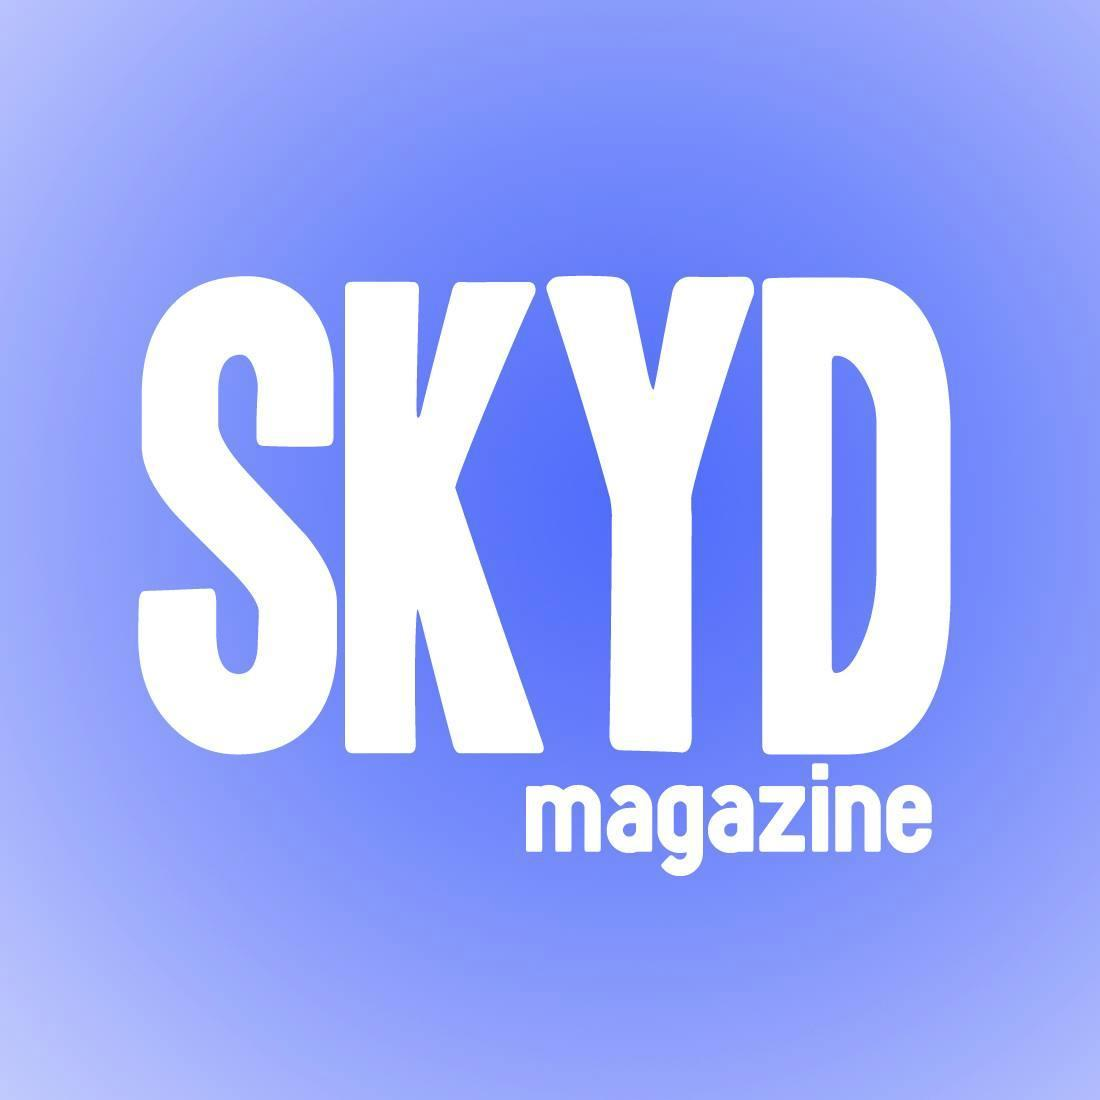 Skyd Magazine